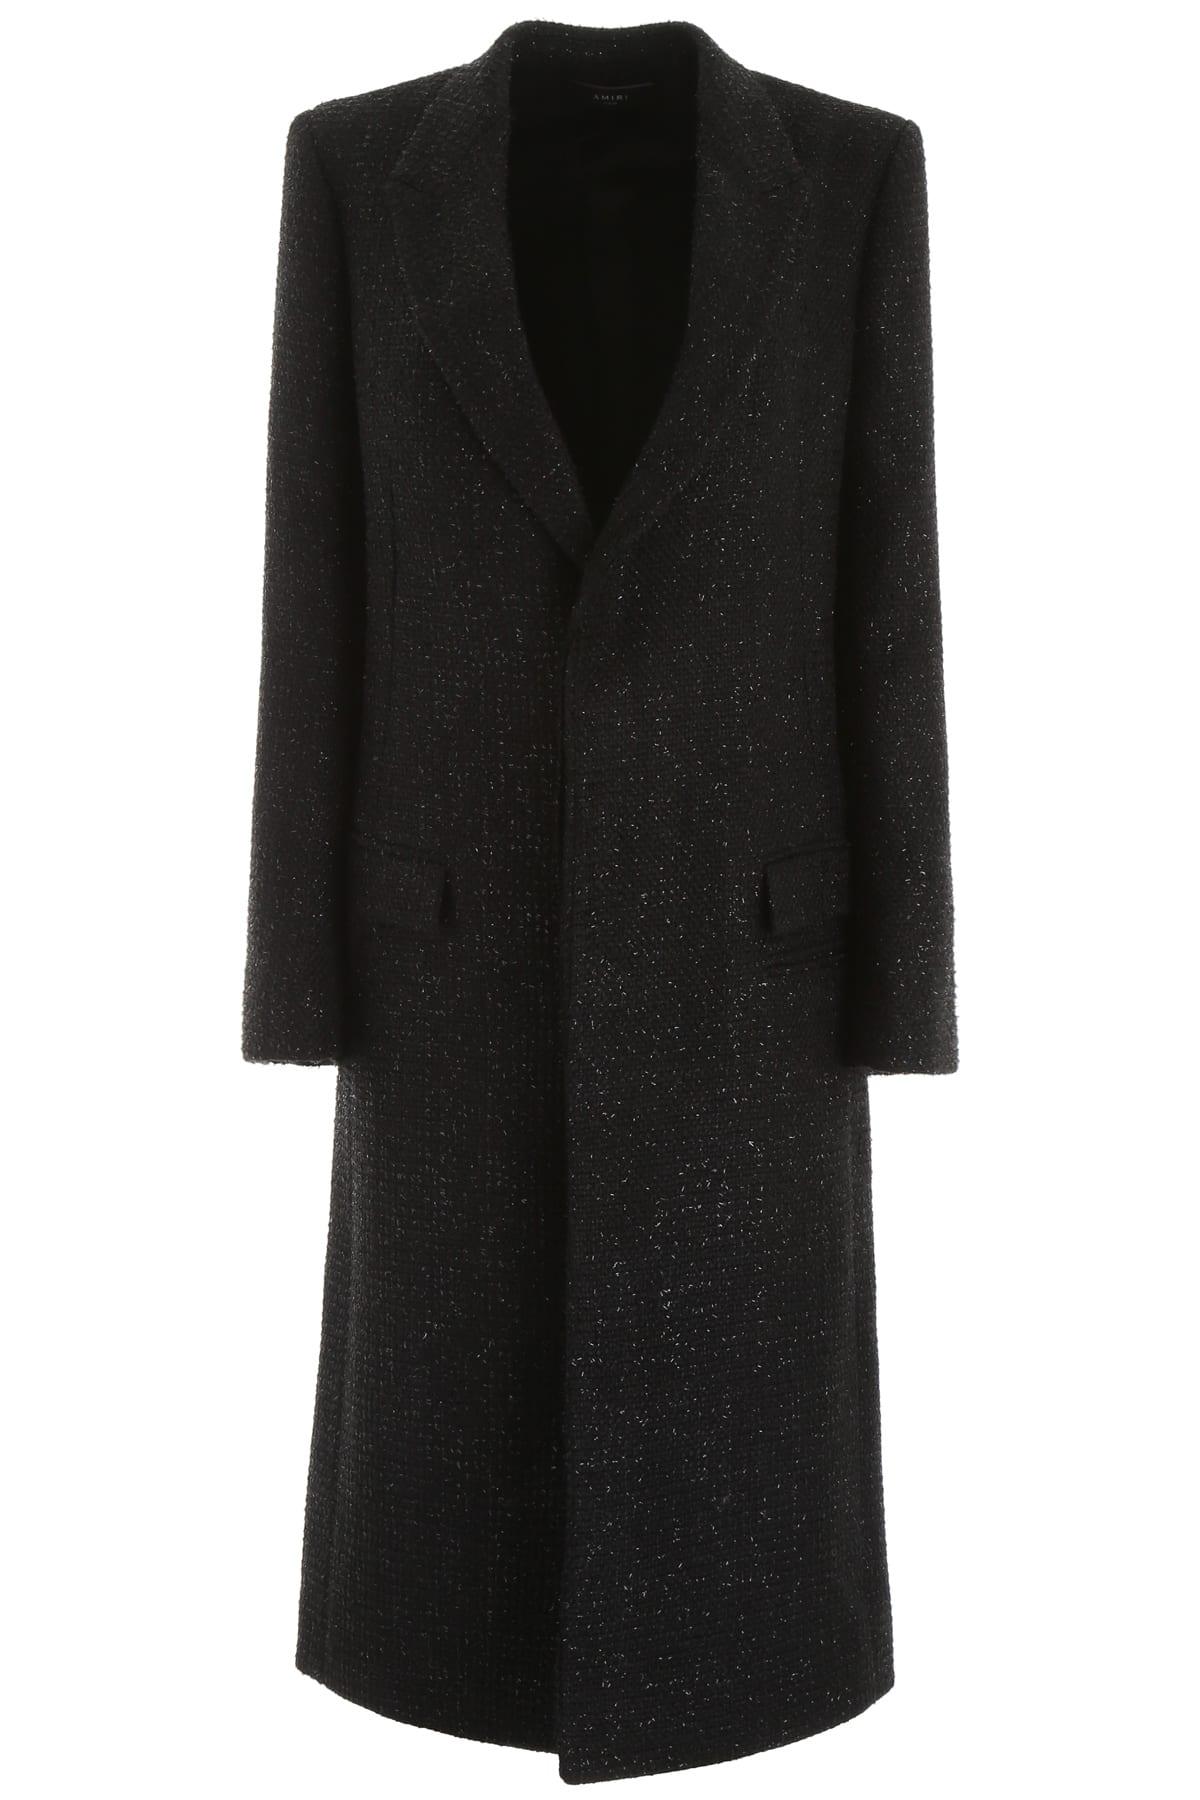 AMIRI Boucle Coat